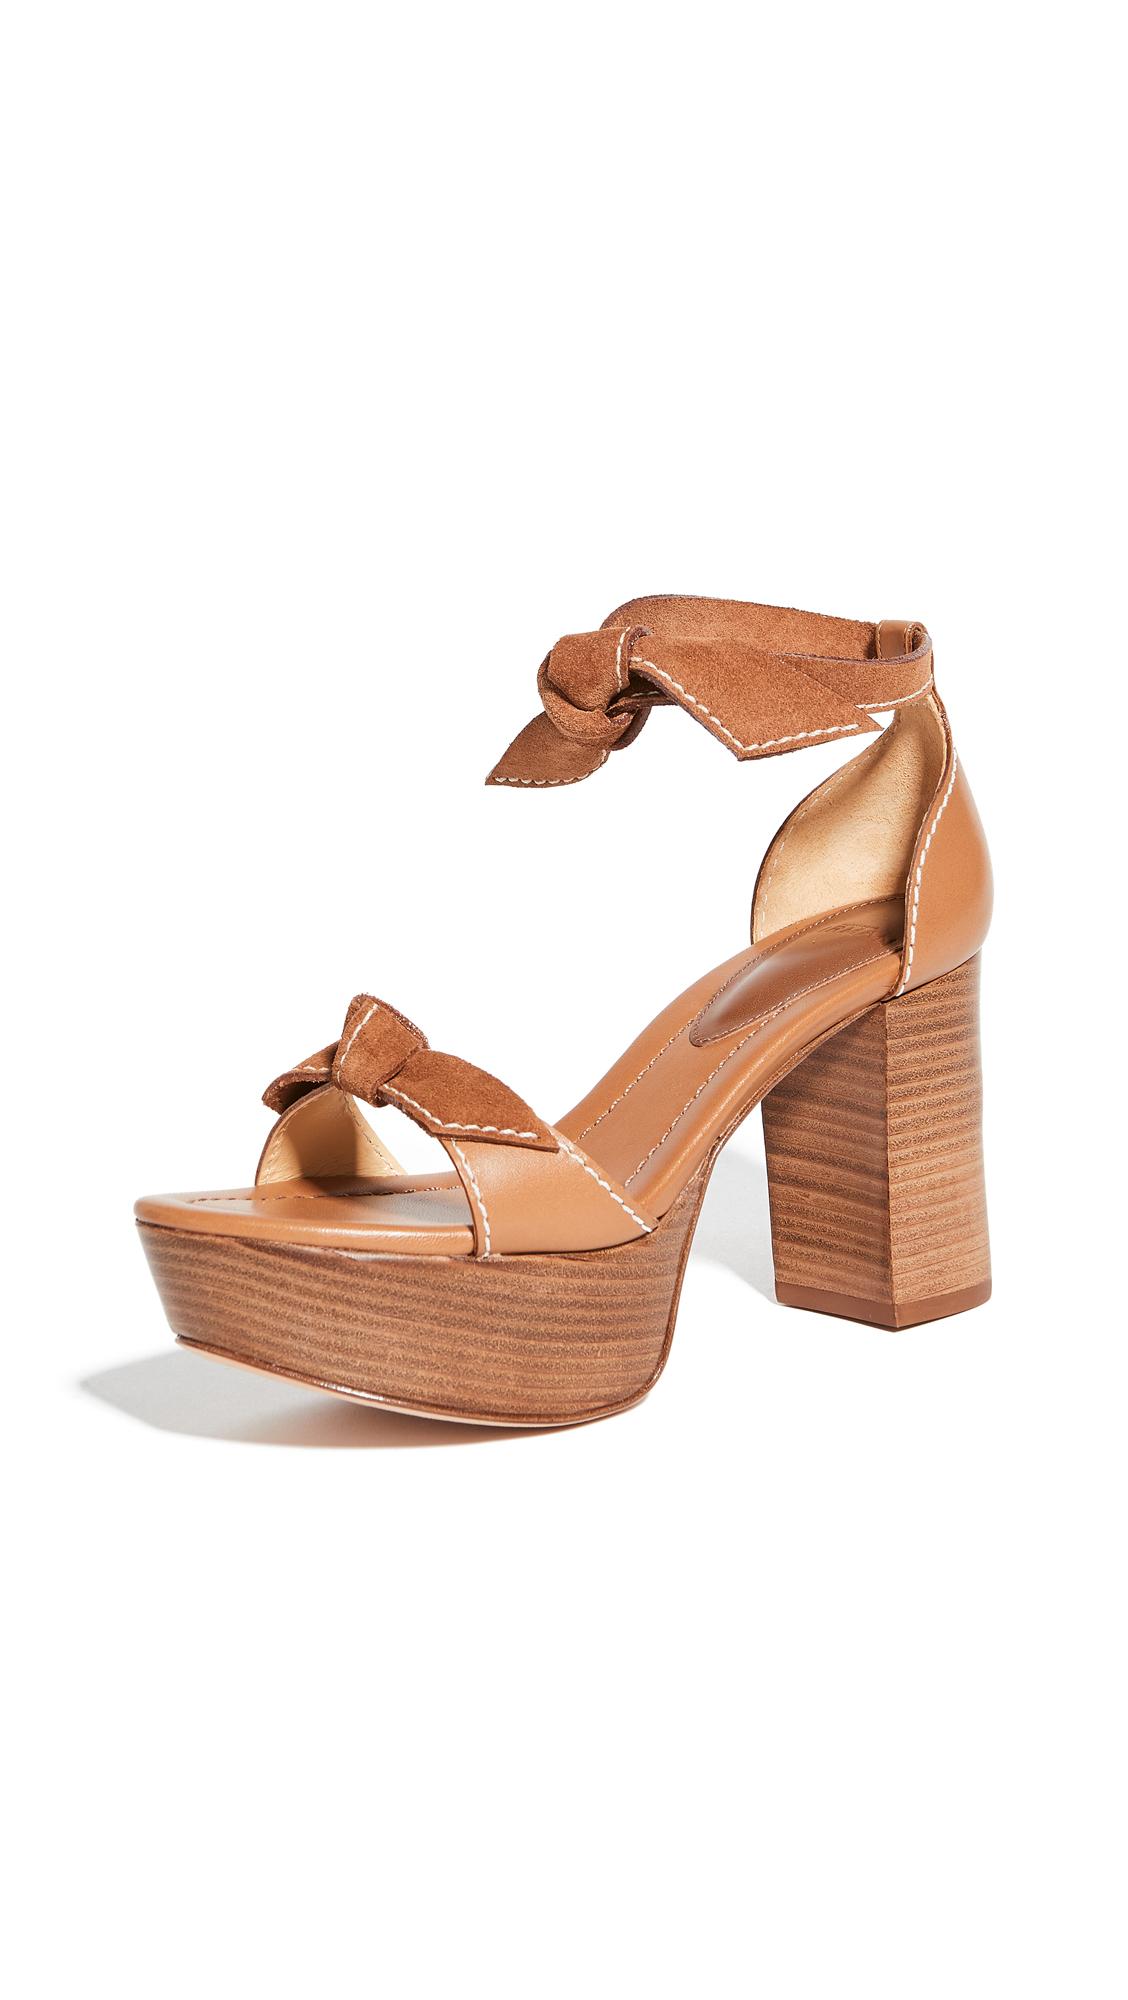 Alexandre Birman 85mm Clarita Plateau Sandals - 40% Off Sale